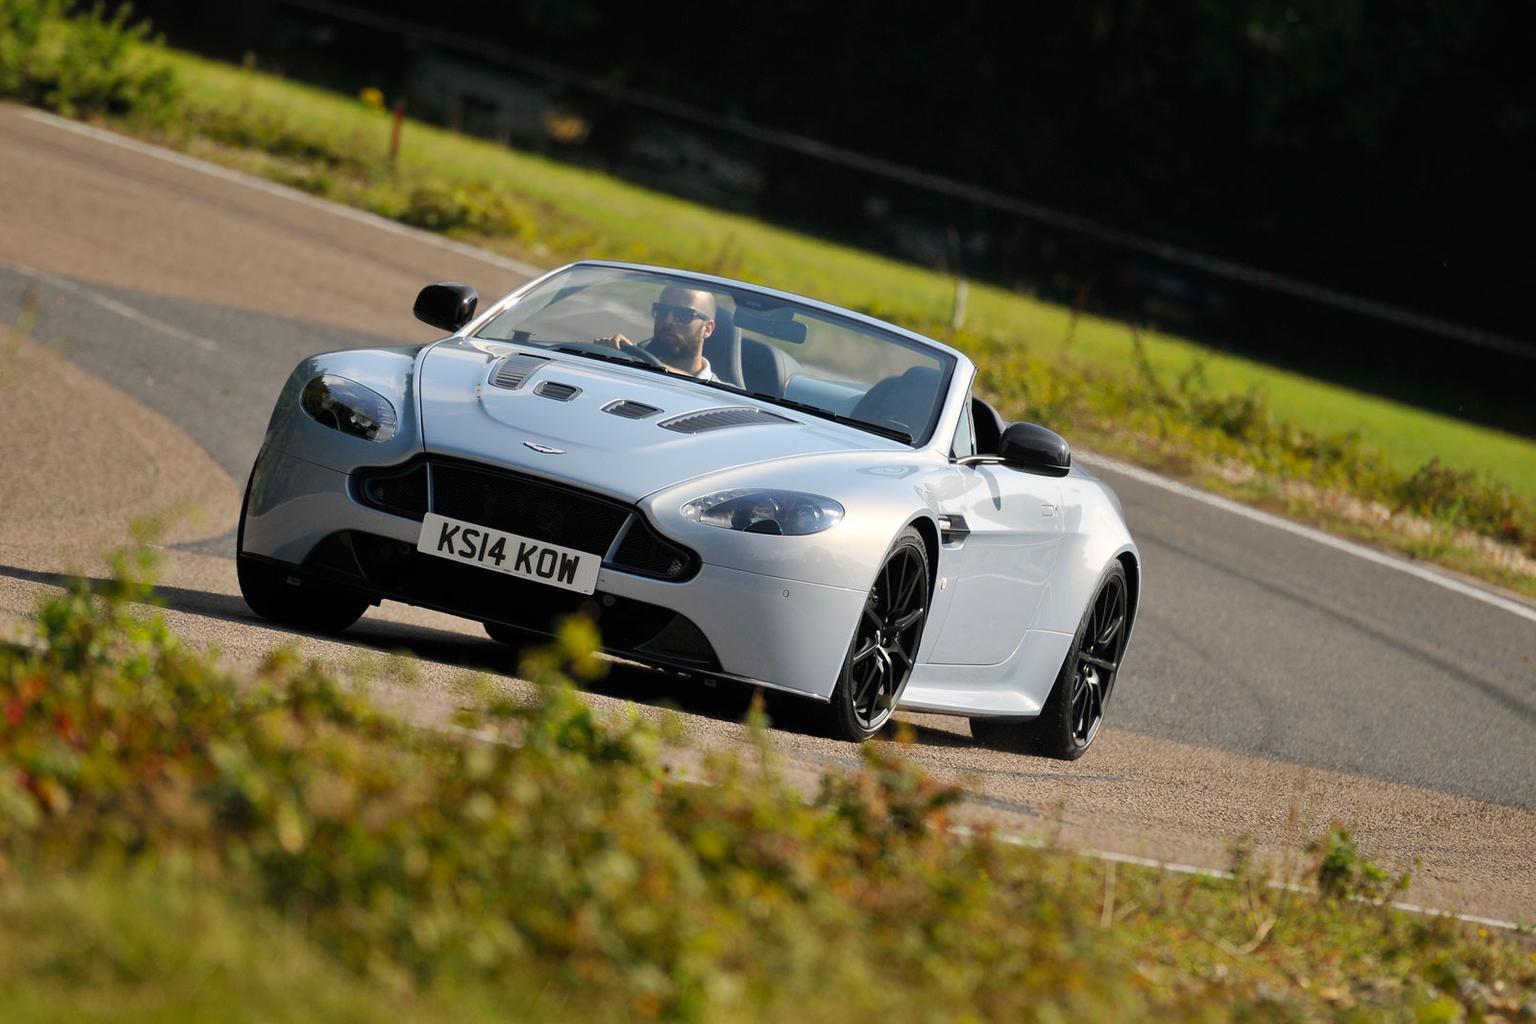 2014 Aston Martin V12 Vantage S Roadster review